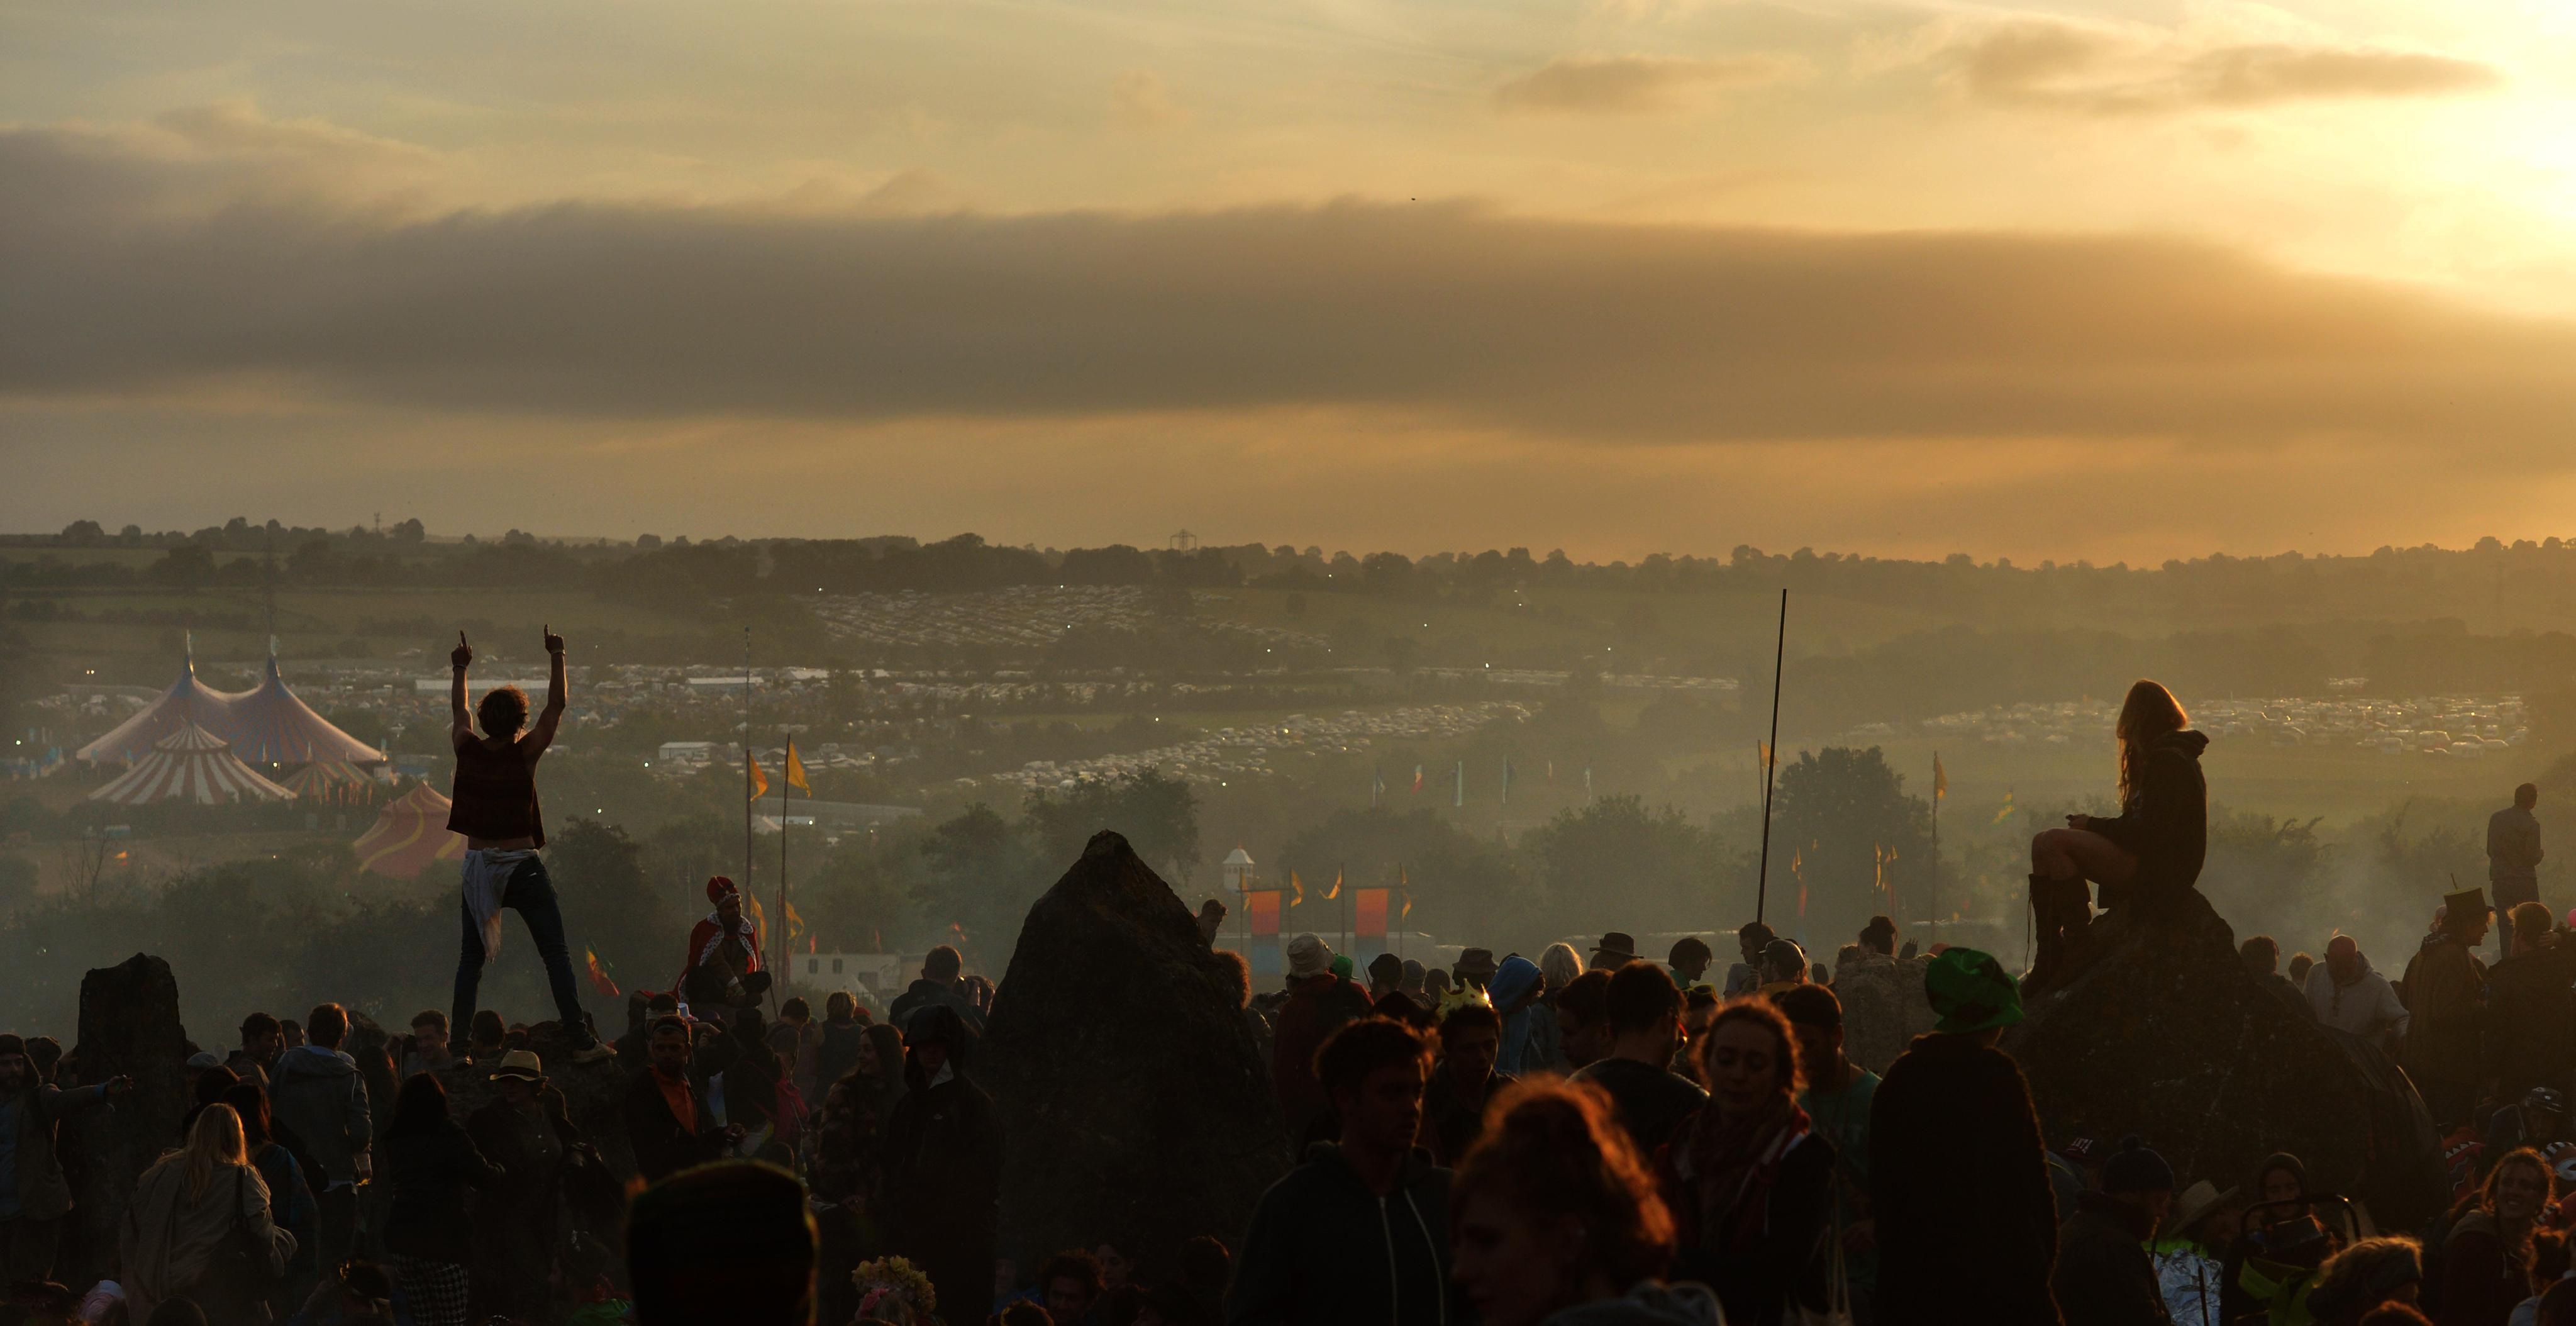 Glastonbury sunrise 2013